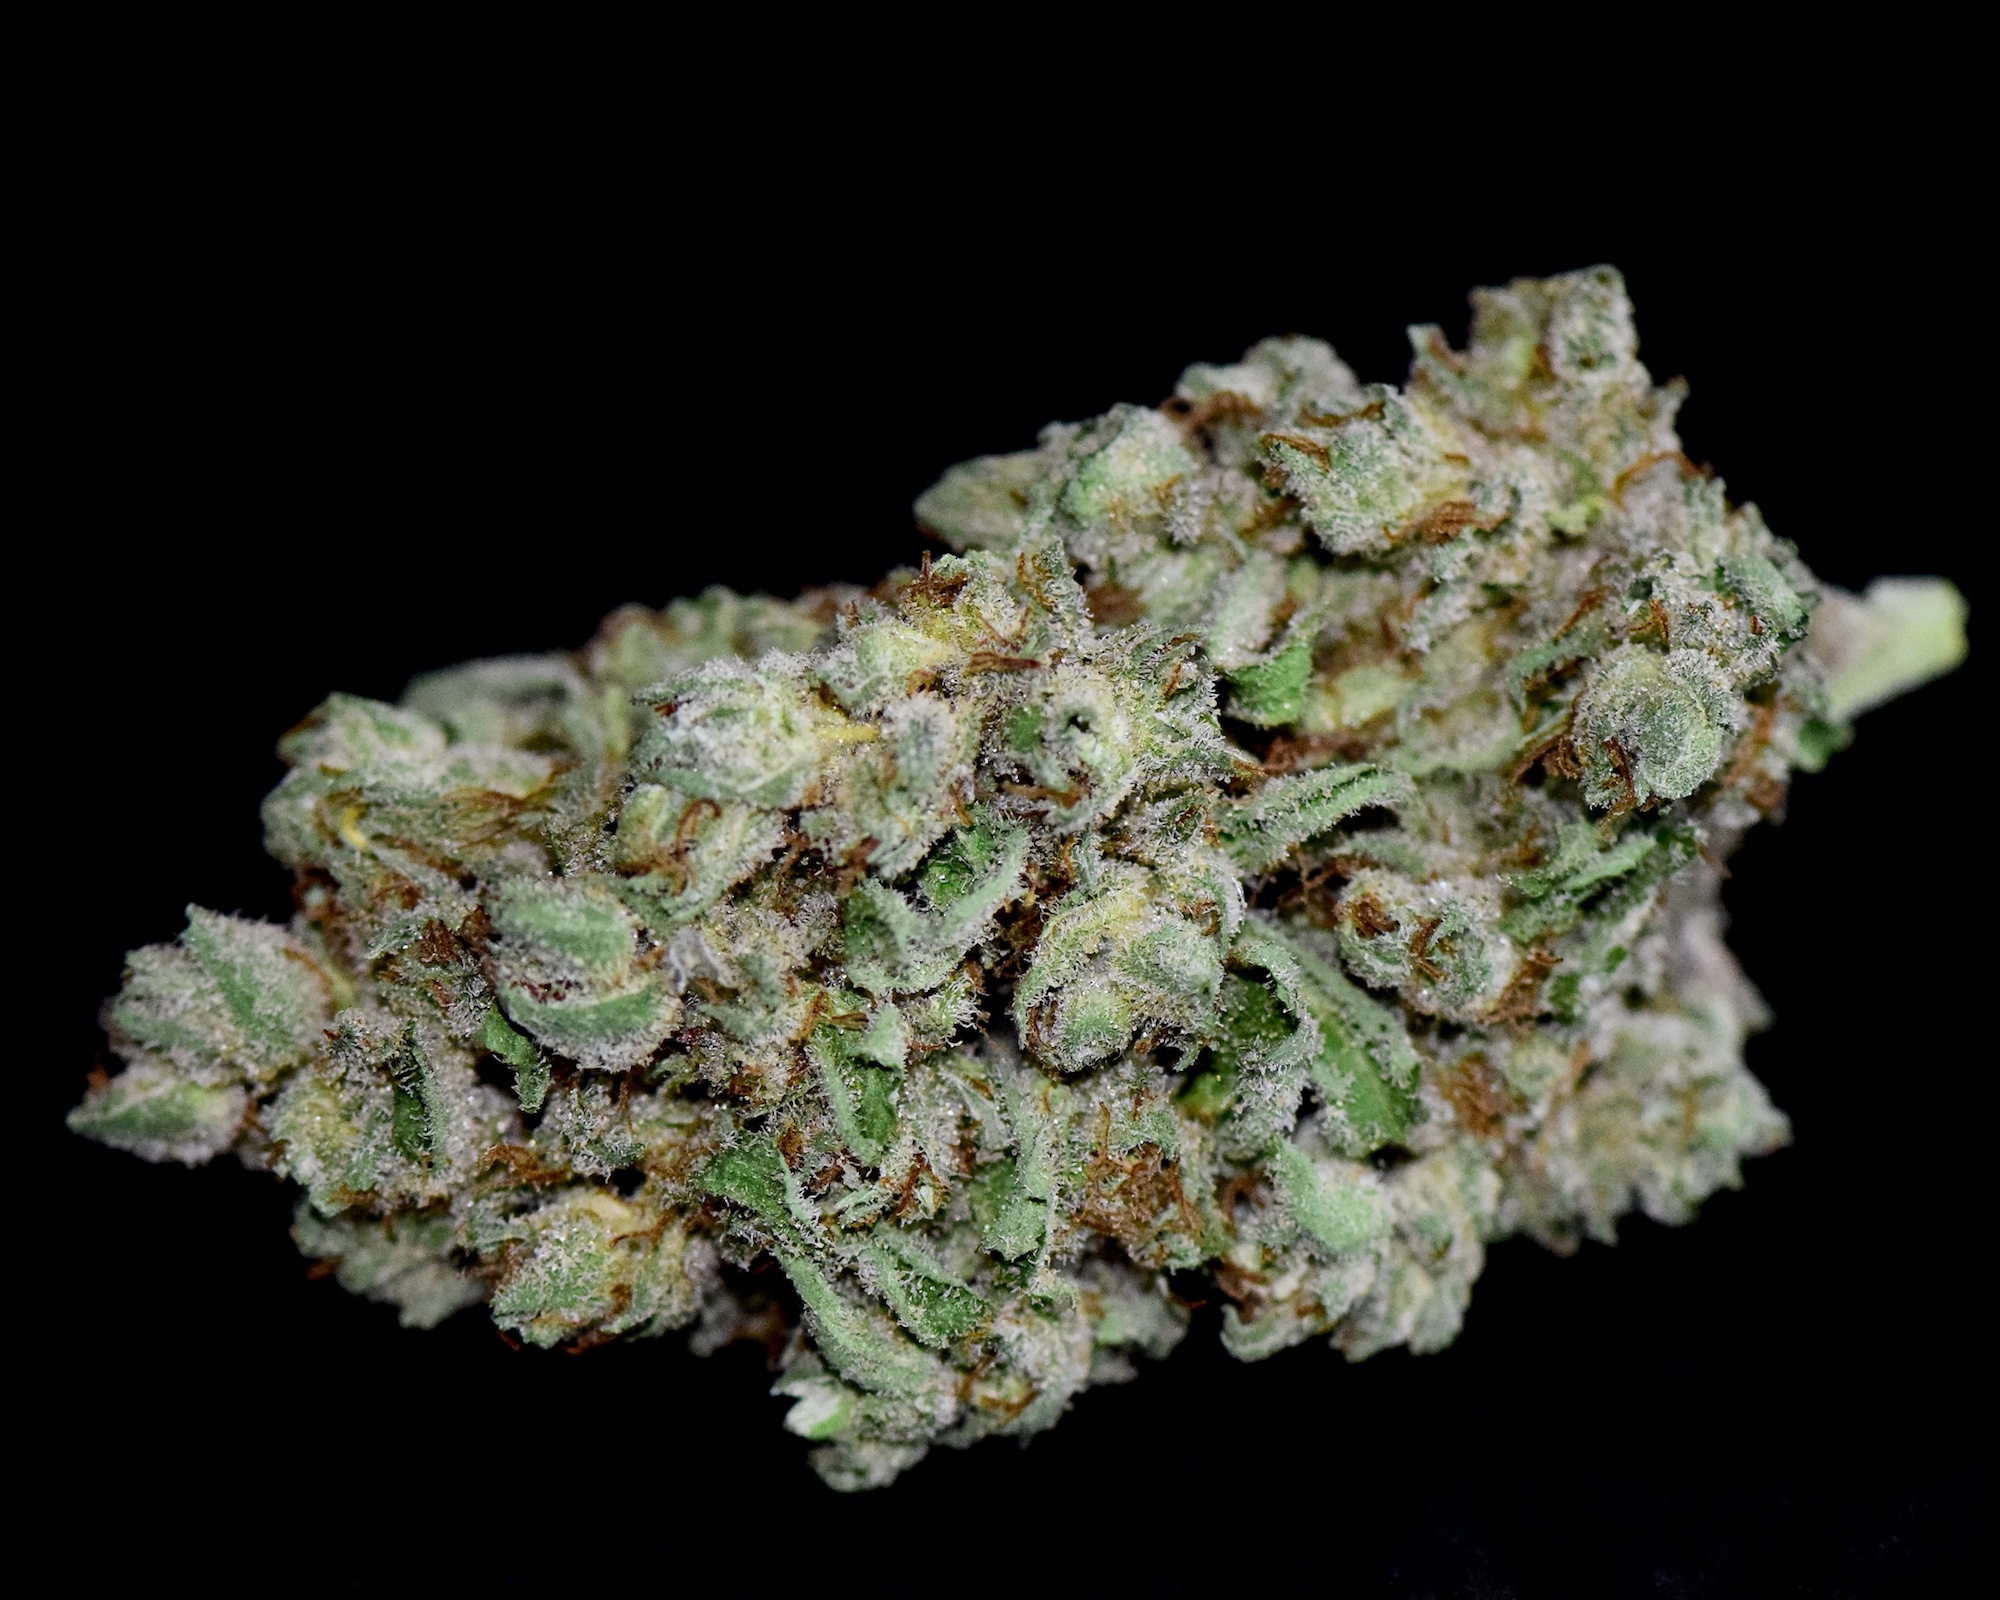 Lemon Sorbet - The Herbal Cure: Denver's Premier Cannabis